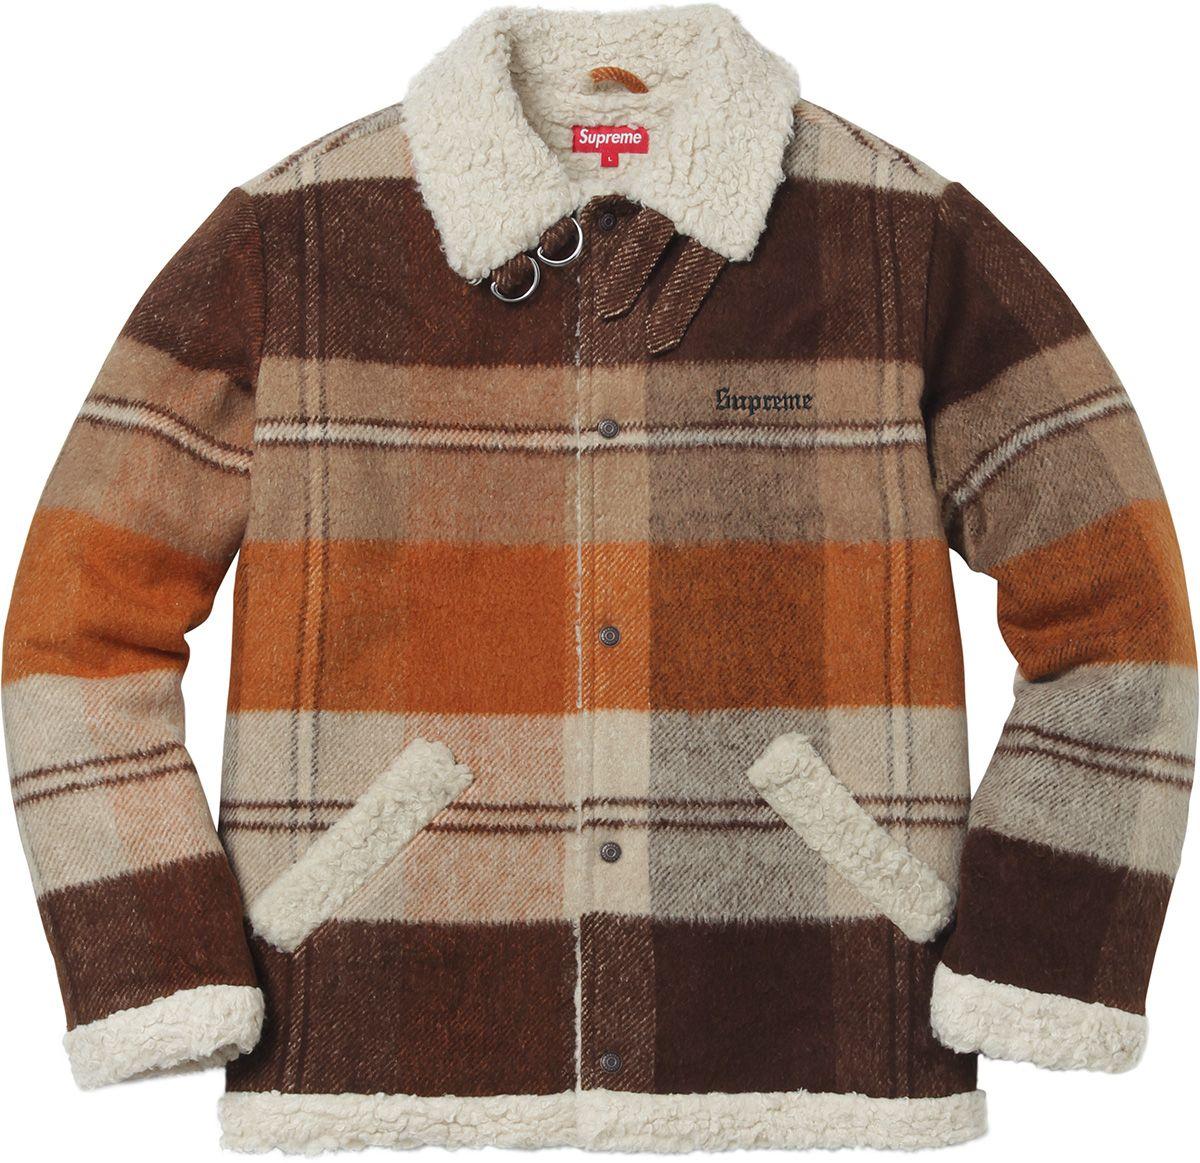 fa9589aac097 Supreme - Plaid Shearling Bomber   Clothes   Shearling jacket, Brown ...